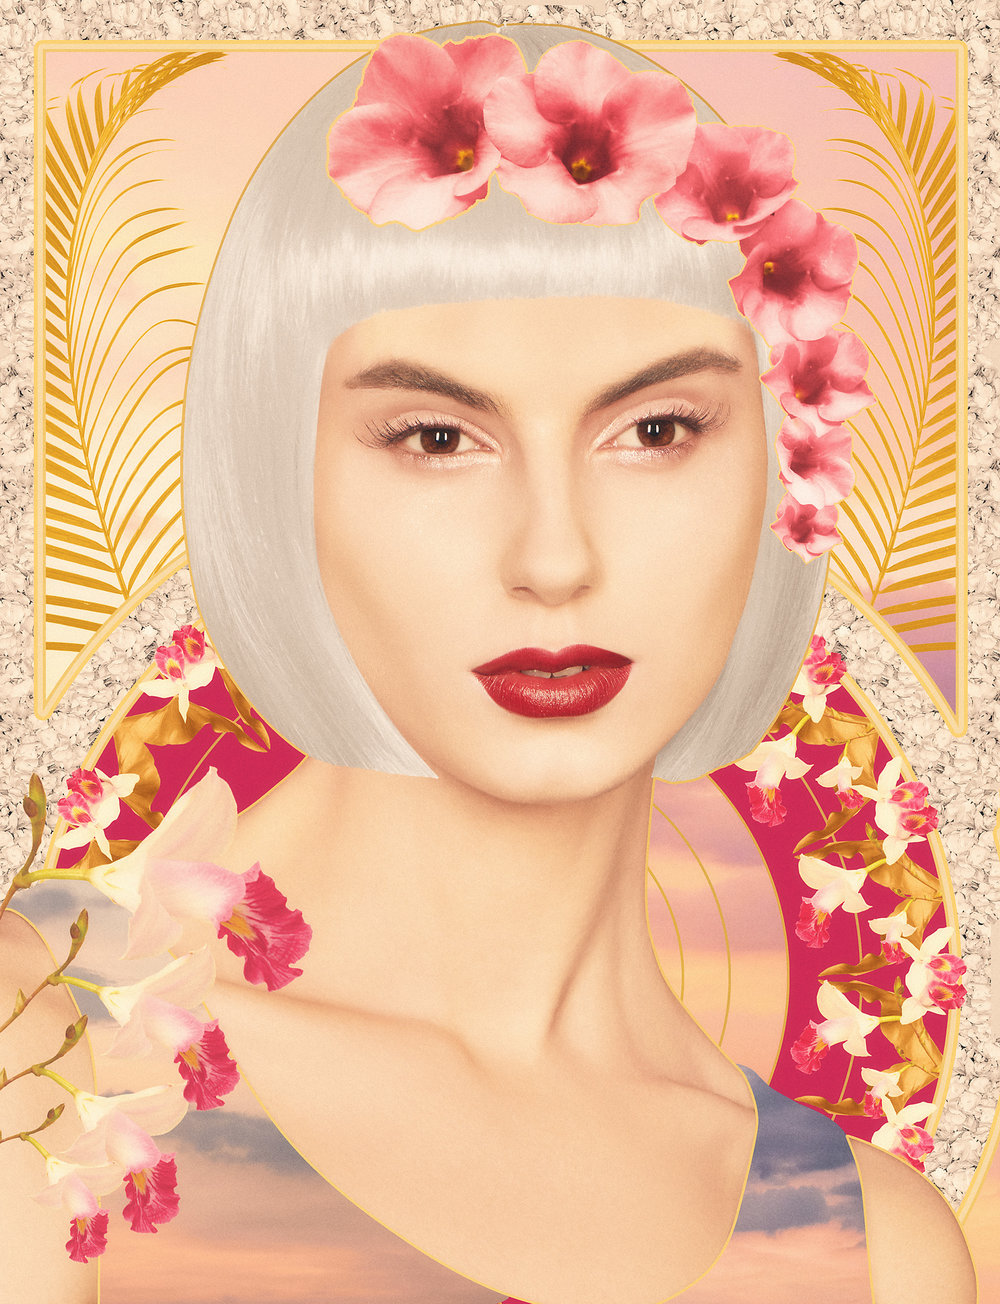 Dior / George McLeod / Luxure Magazine